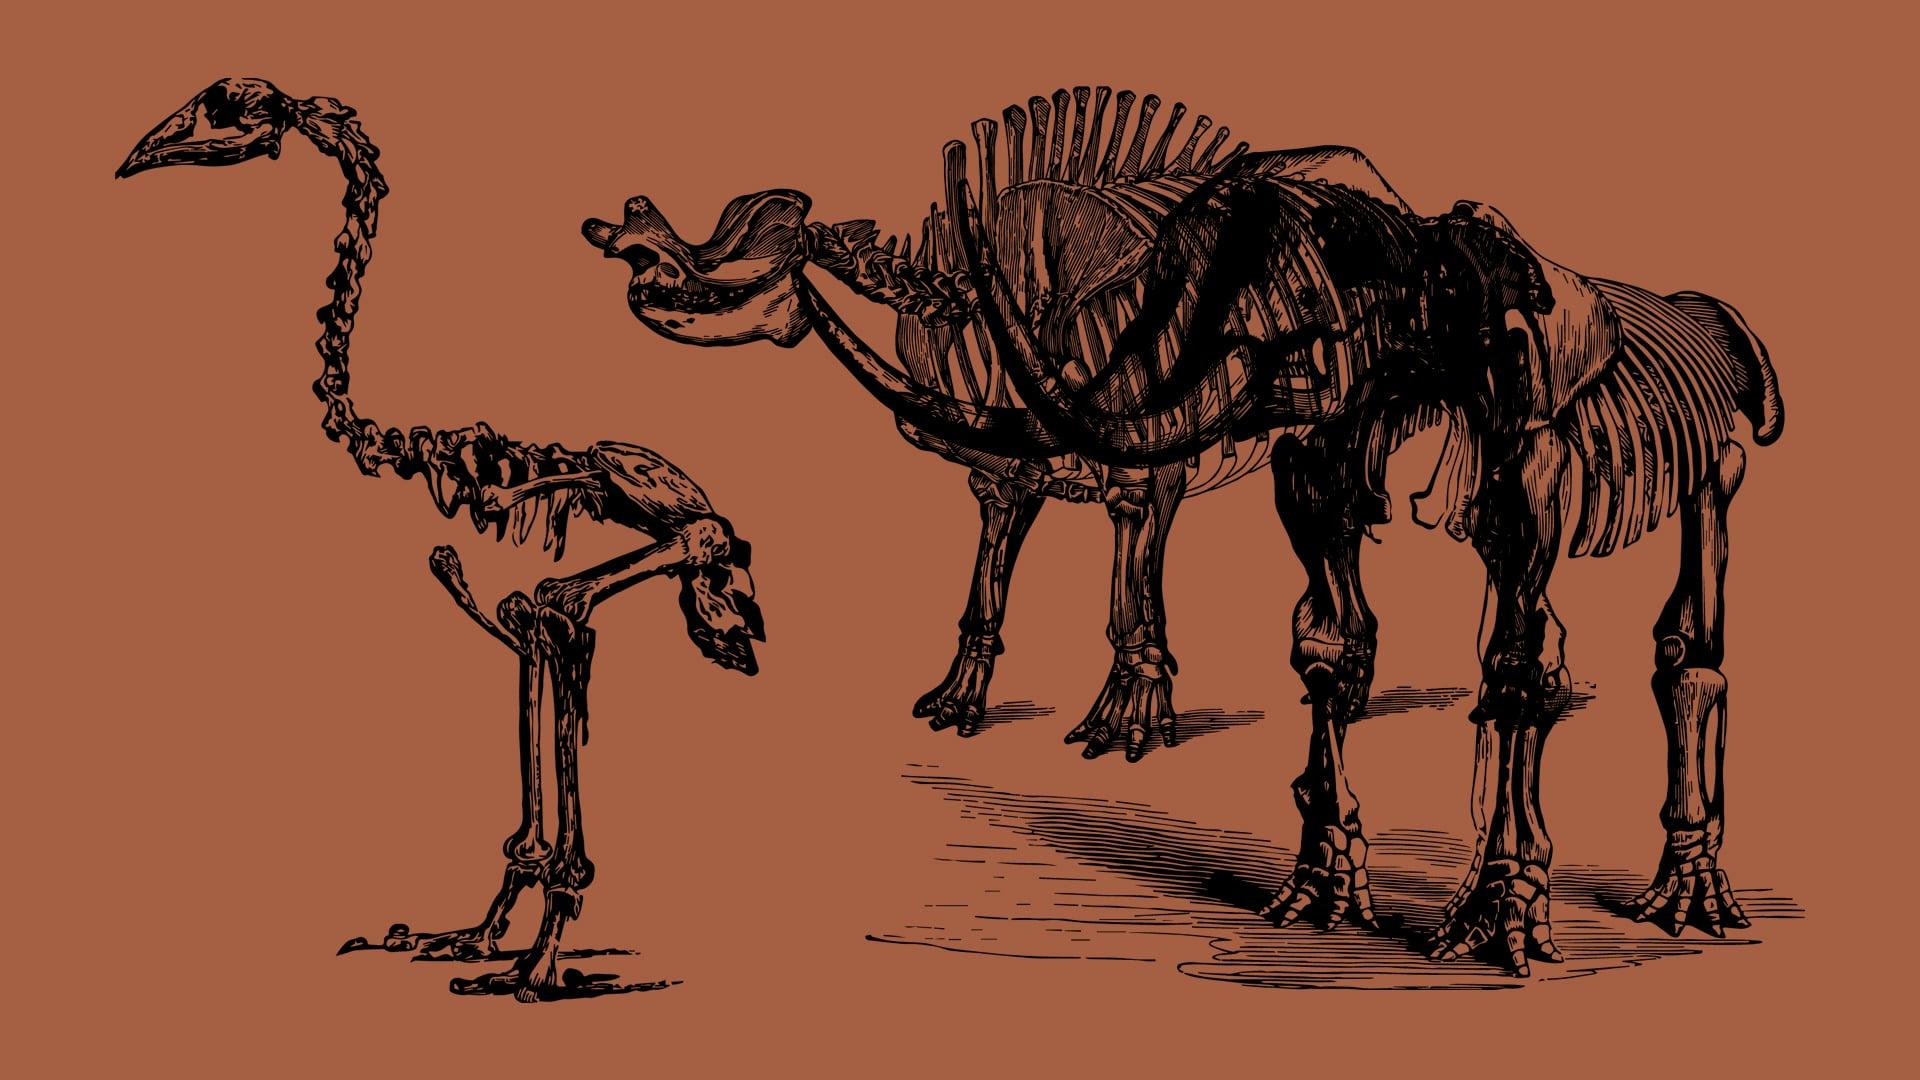 Vintage Paleontology Vector Illustrations